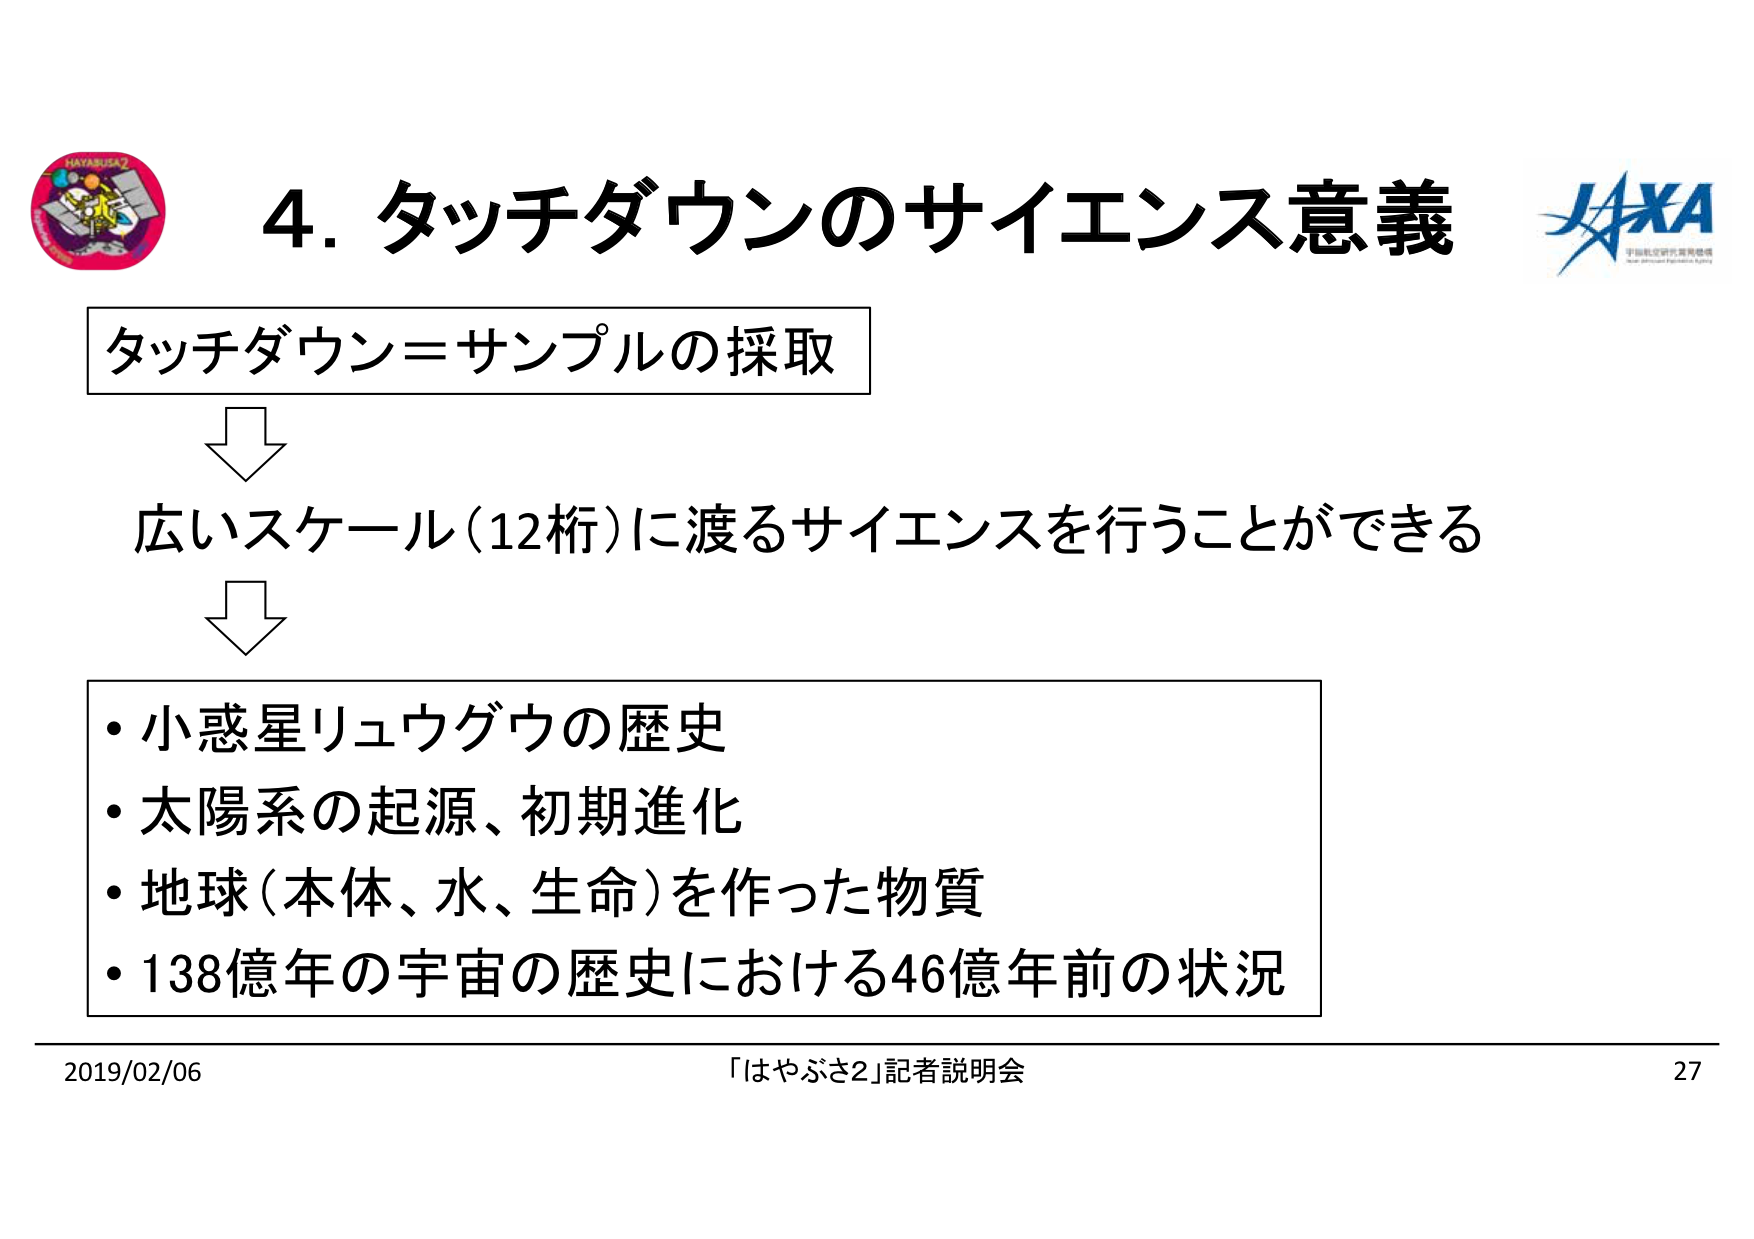 f:id:Imamura:20190204175521p:plain